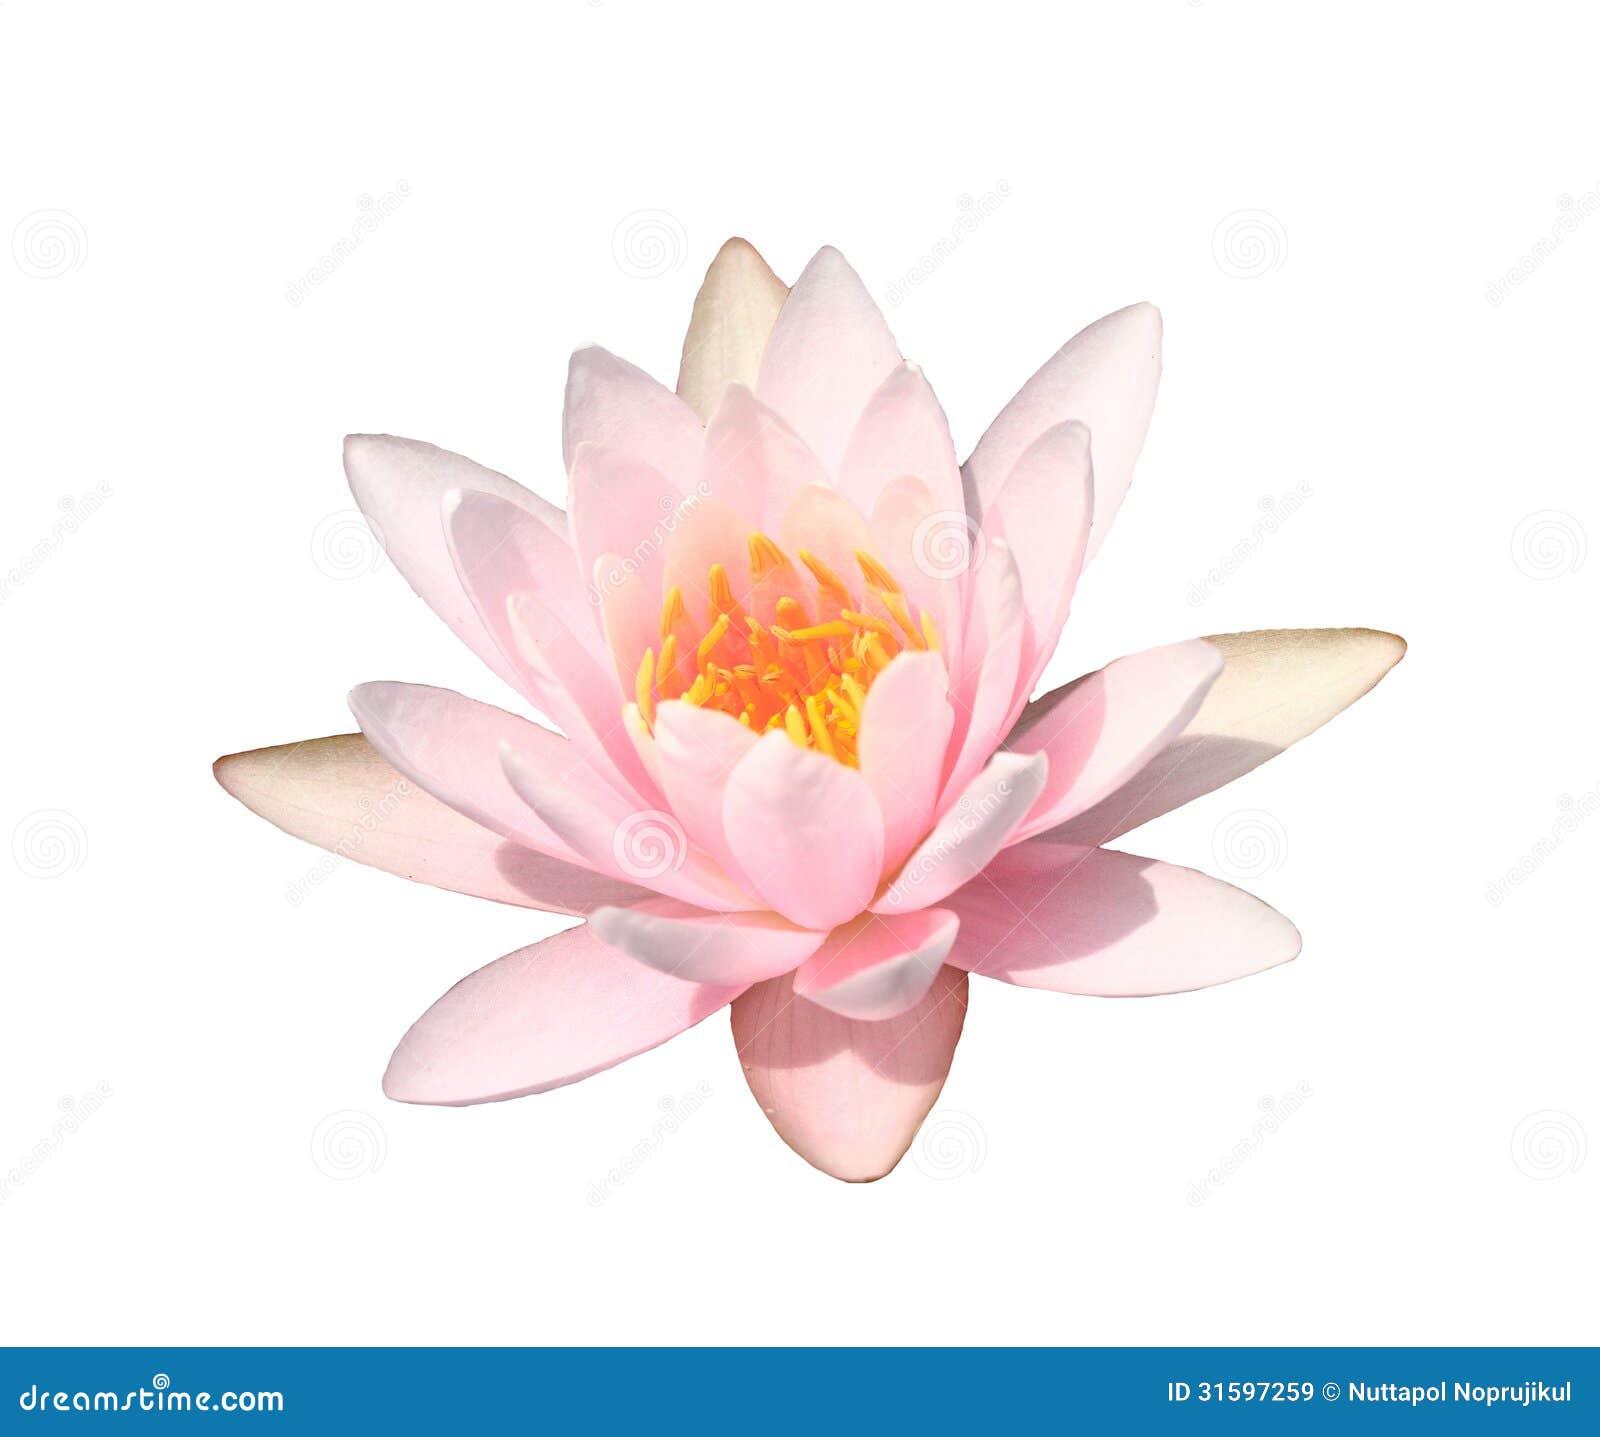 Free Ppt Backgrounds Desktop Wallpaper Flower Pink Lotus: Pink Water Lily On White Background,Pink Lotus Stock Image